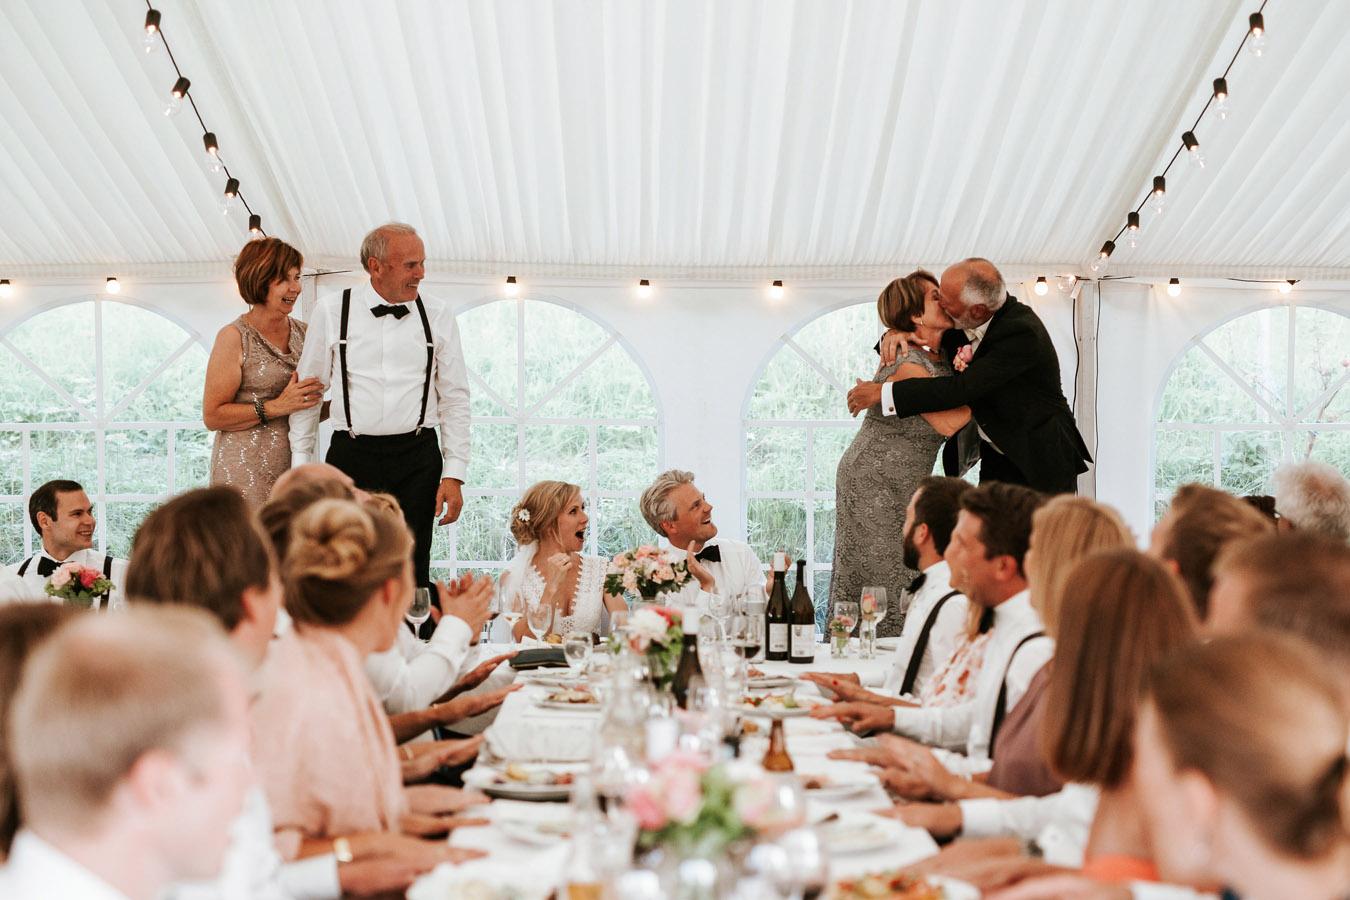 Fotograf-Tone-Tvedt-bryllup-194.jpg